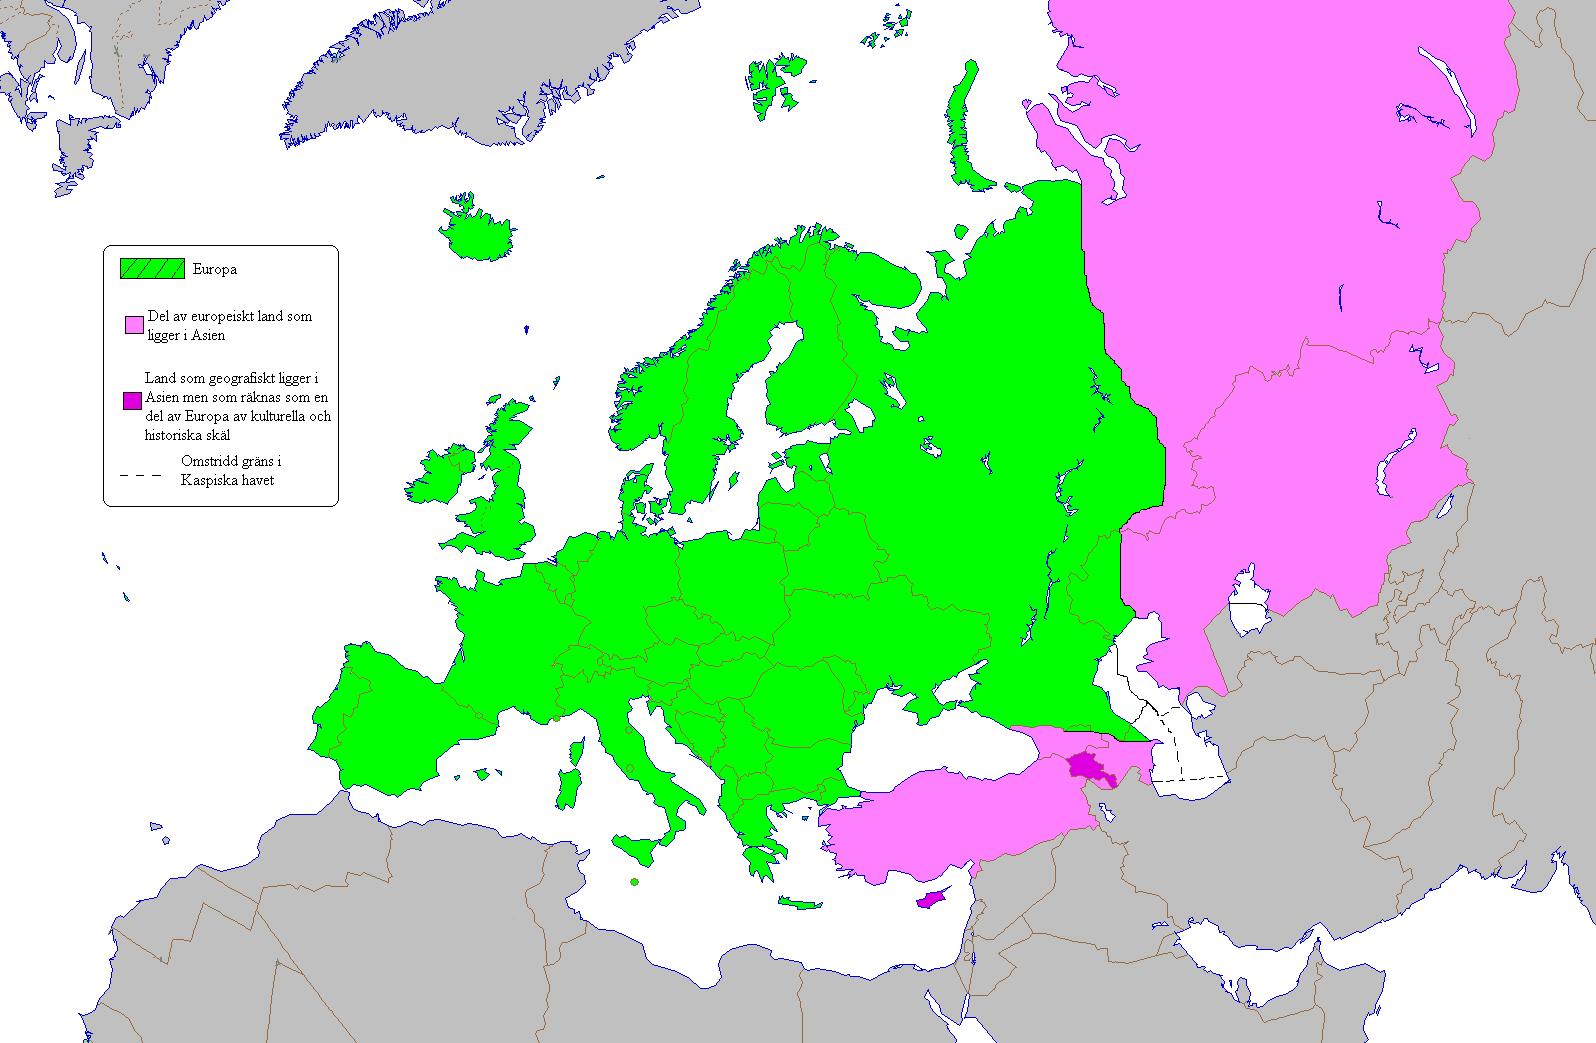 europa politisk karta Fil:Europa politisk karta.PNG – Wikipedia europa politisk karta